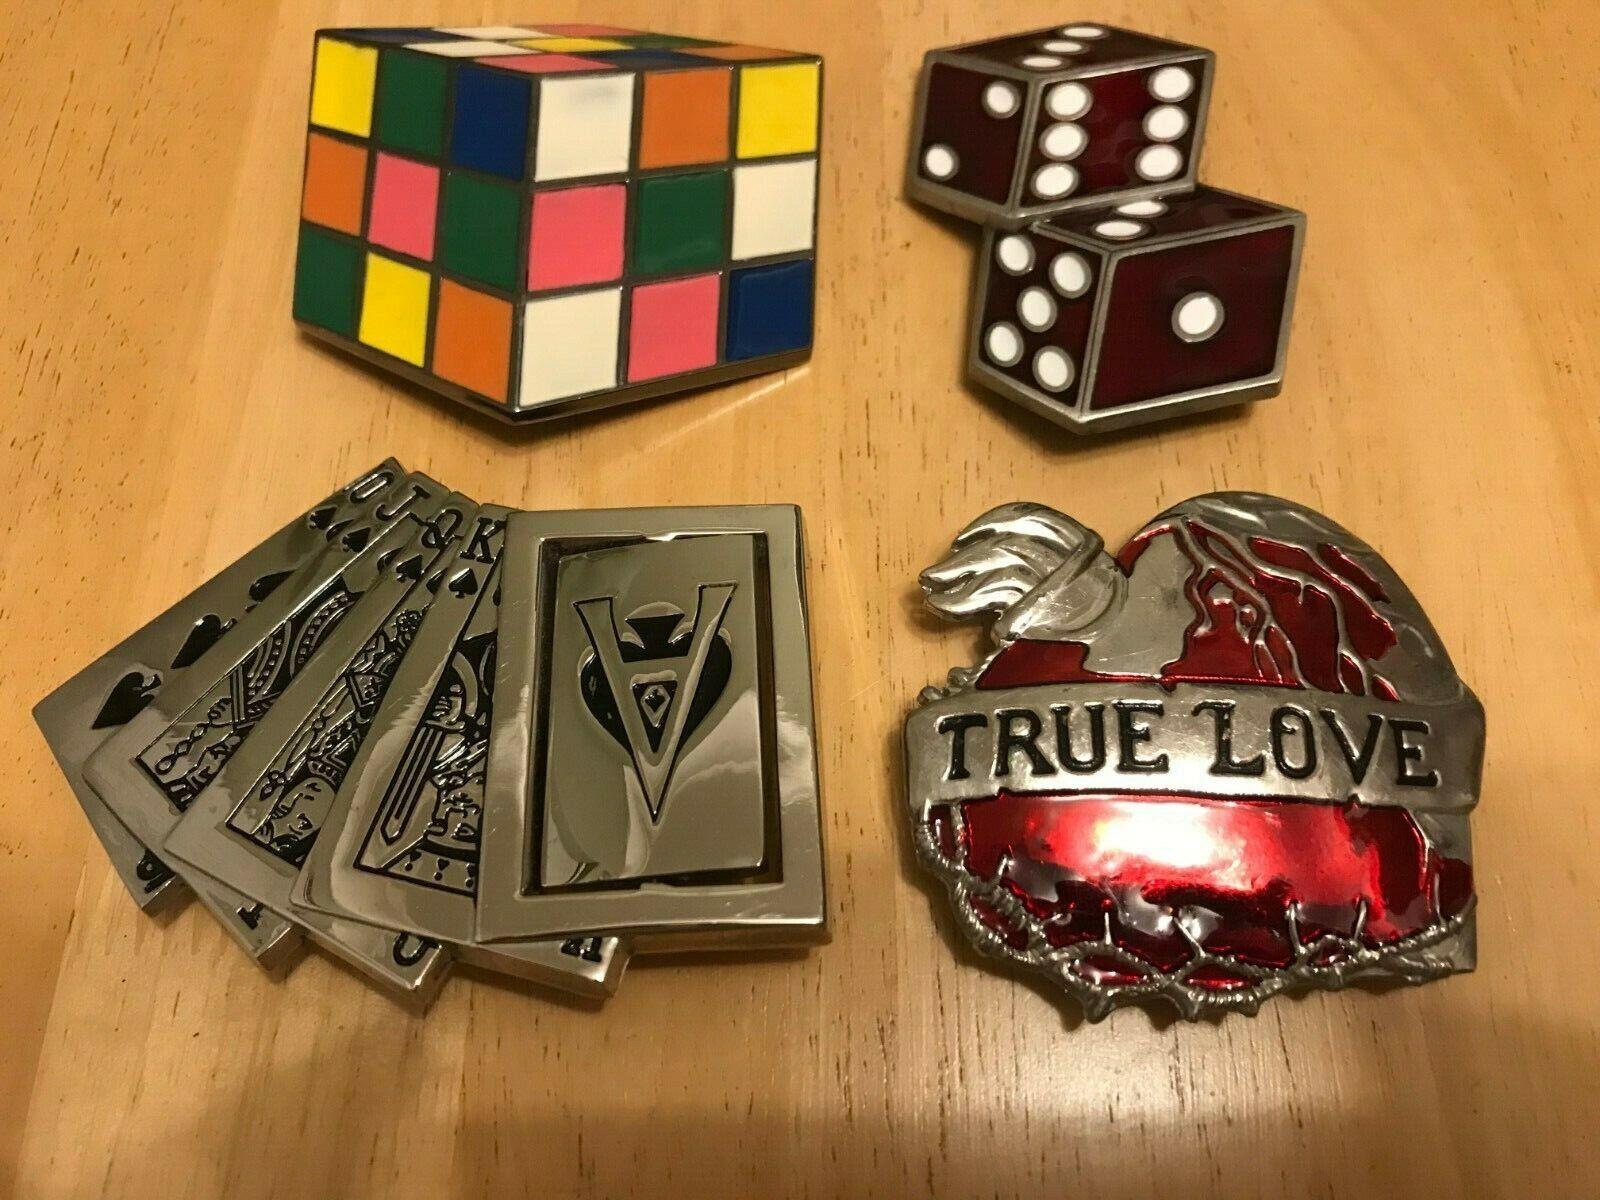 4 x Belt Buckles including 3D Rubix Cube,Dice,Playing Cards,True Love Men Womens